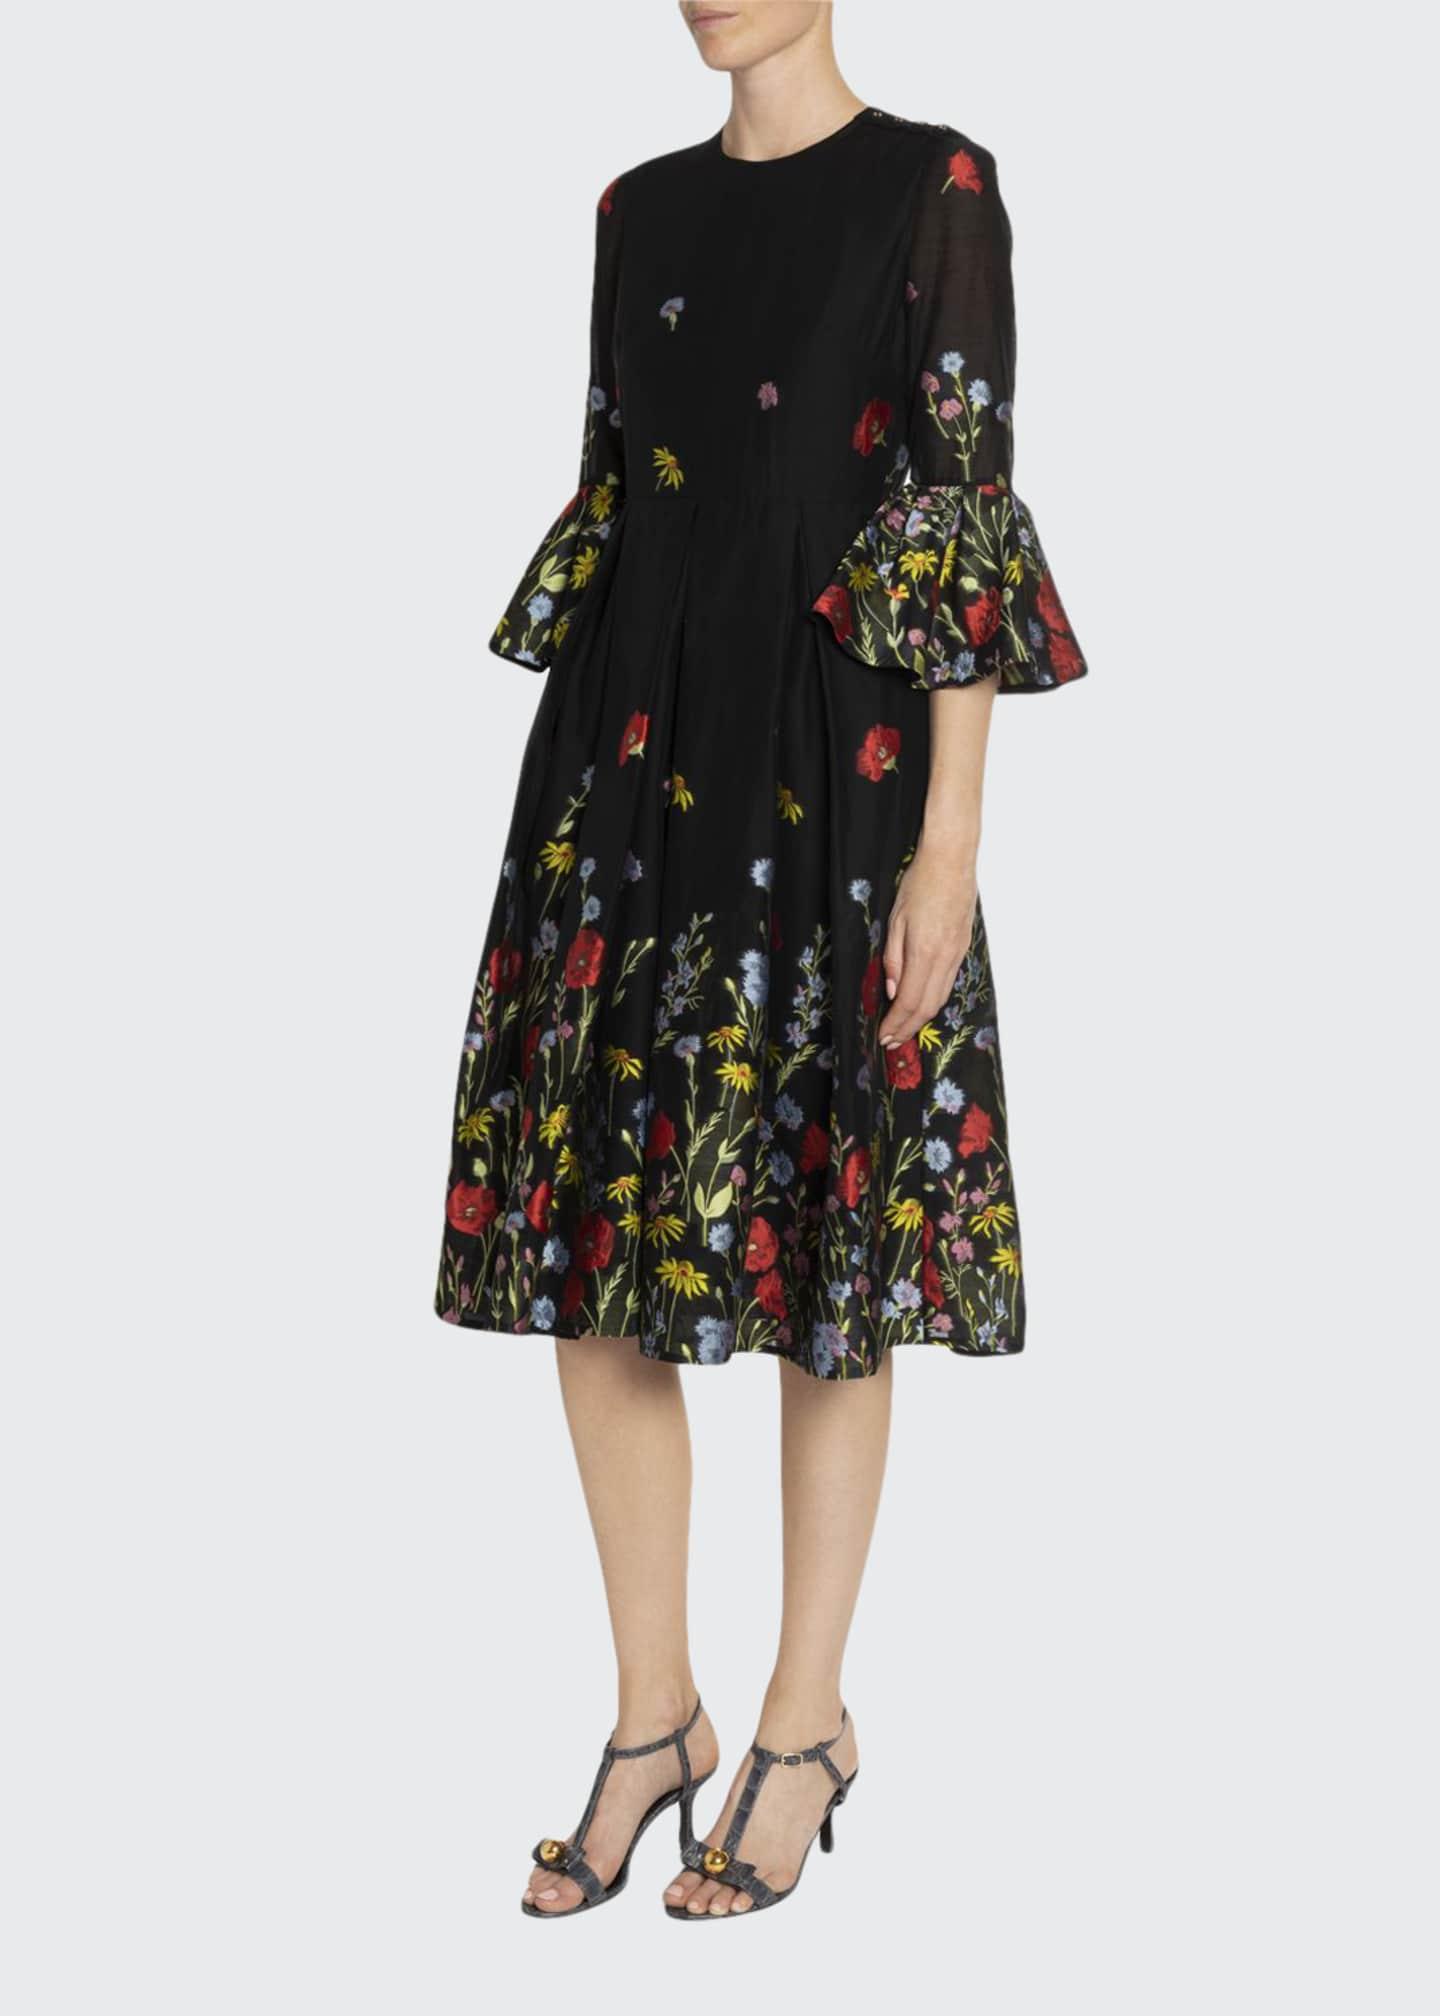 Erdem Irvine Floral Fil Coupe Tulip-Sleeve Dress